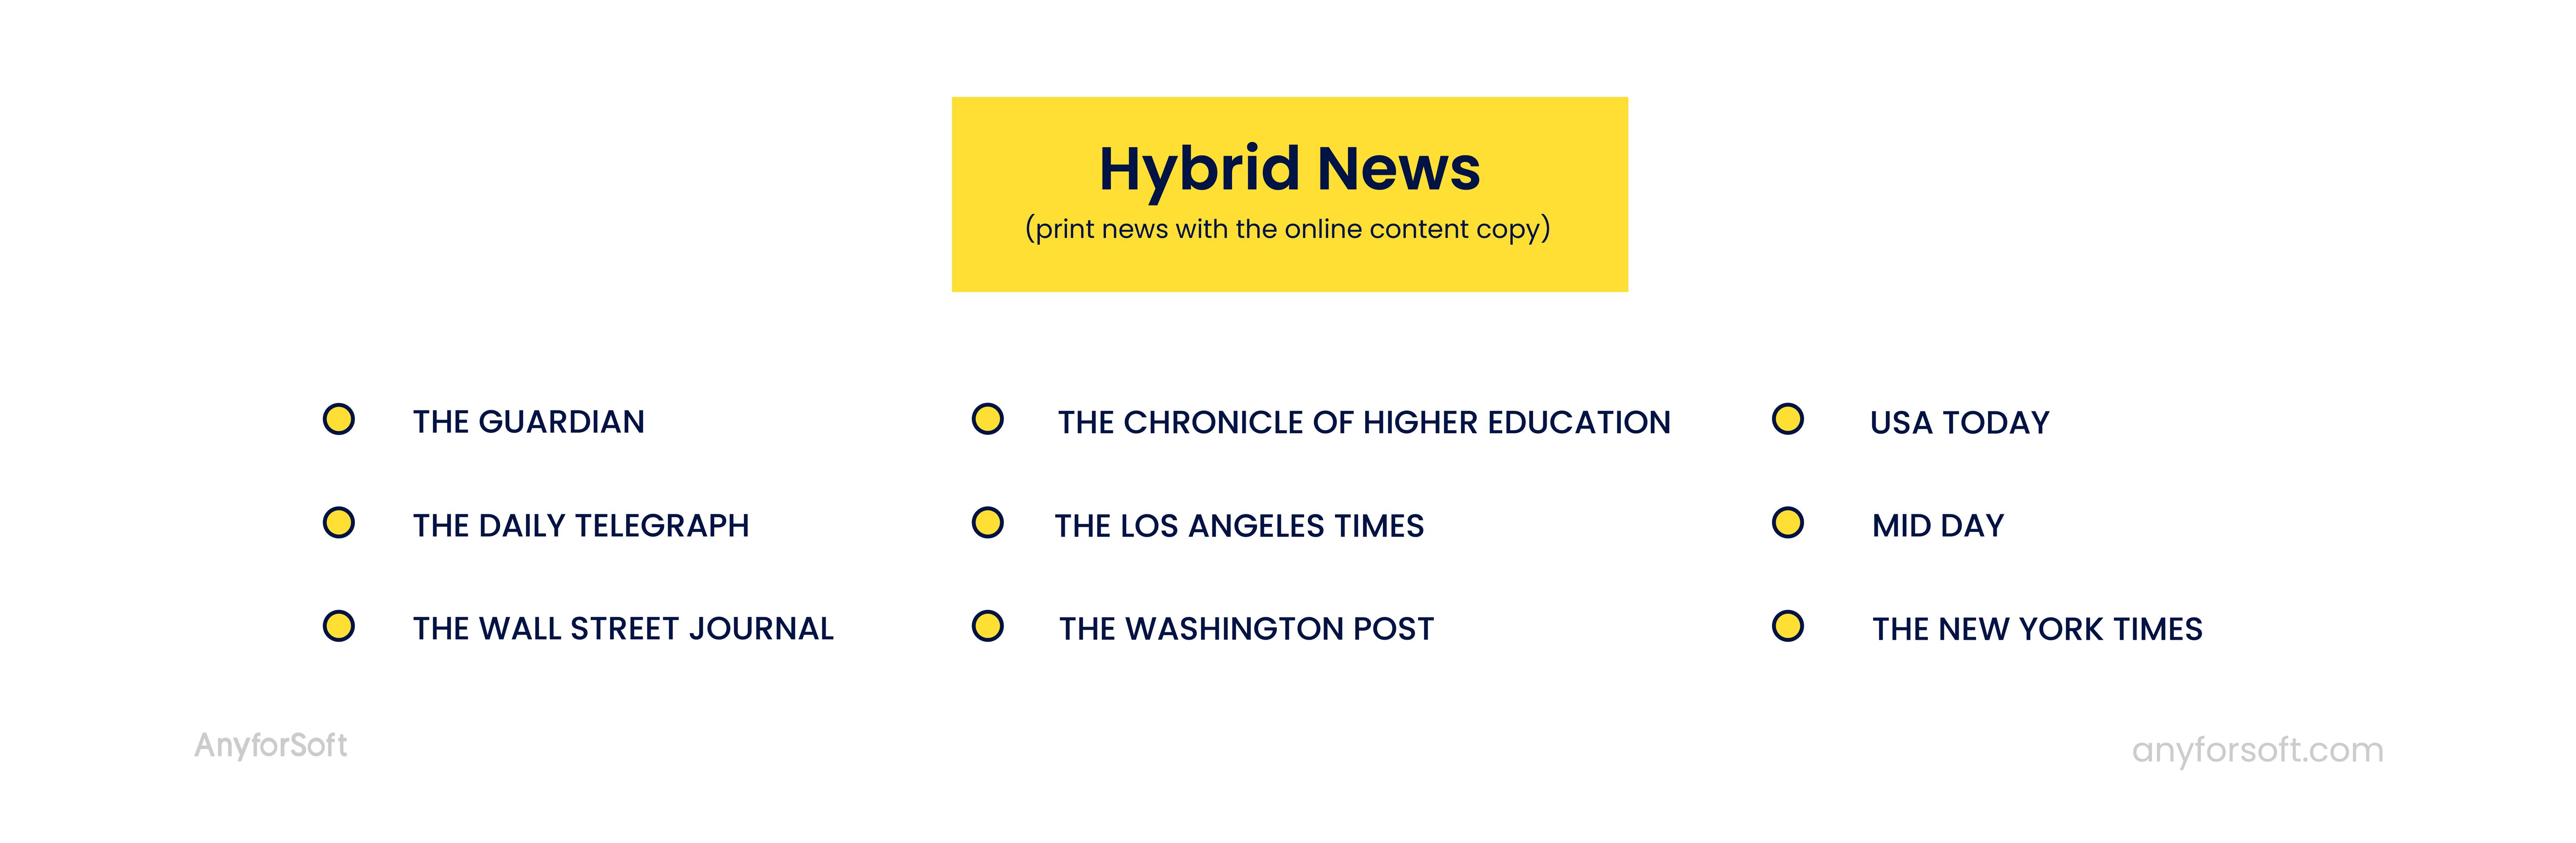 hybrid news websites examples